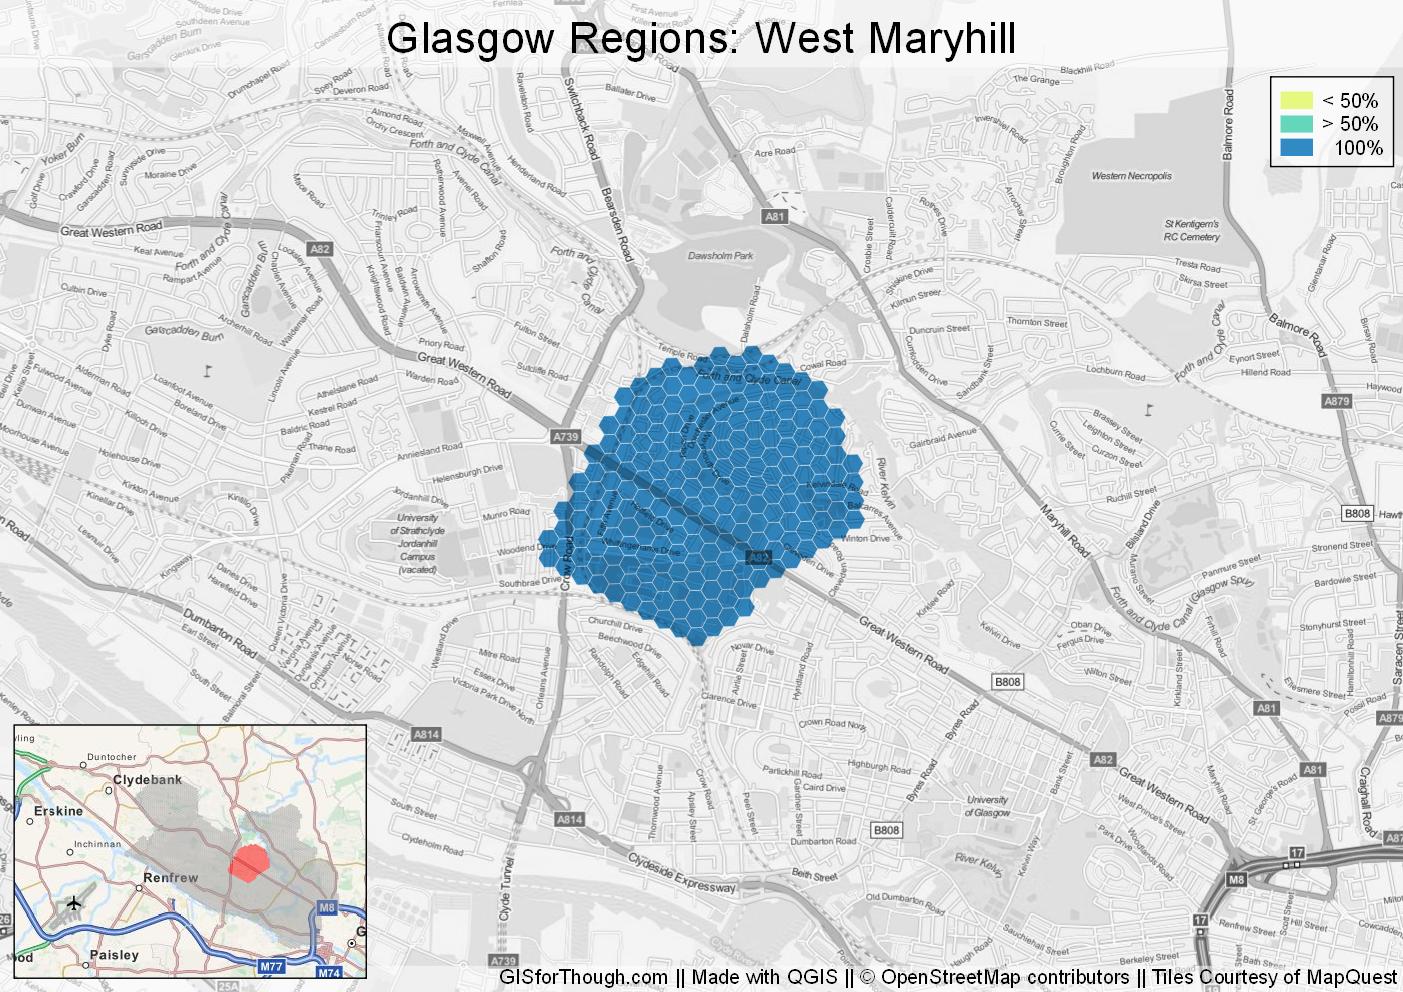 West Maryhill